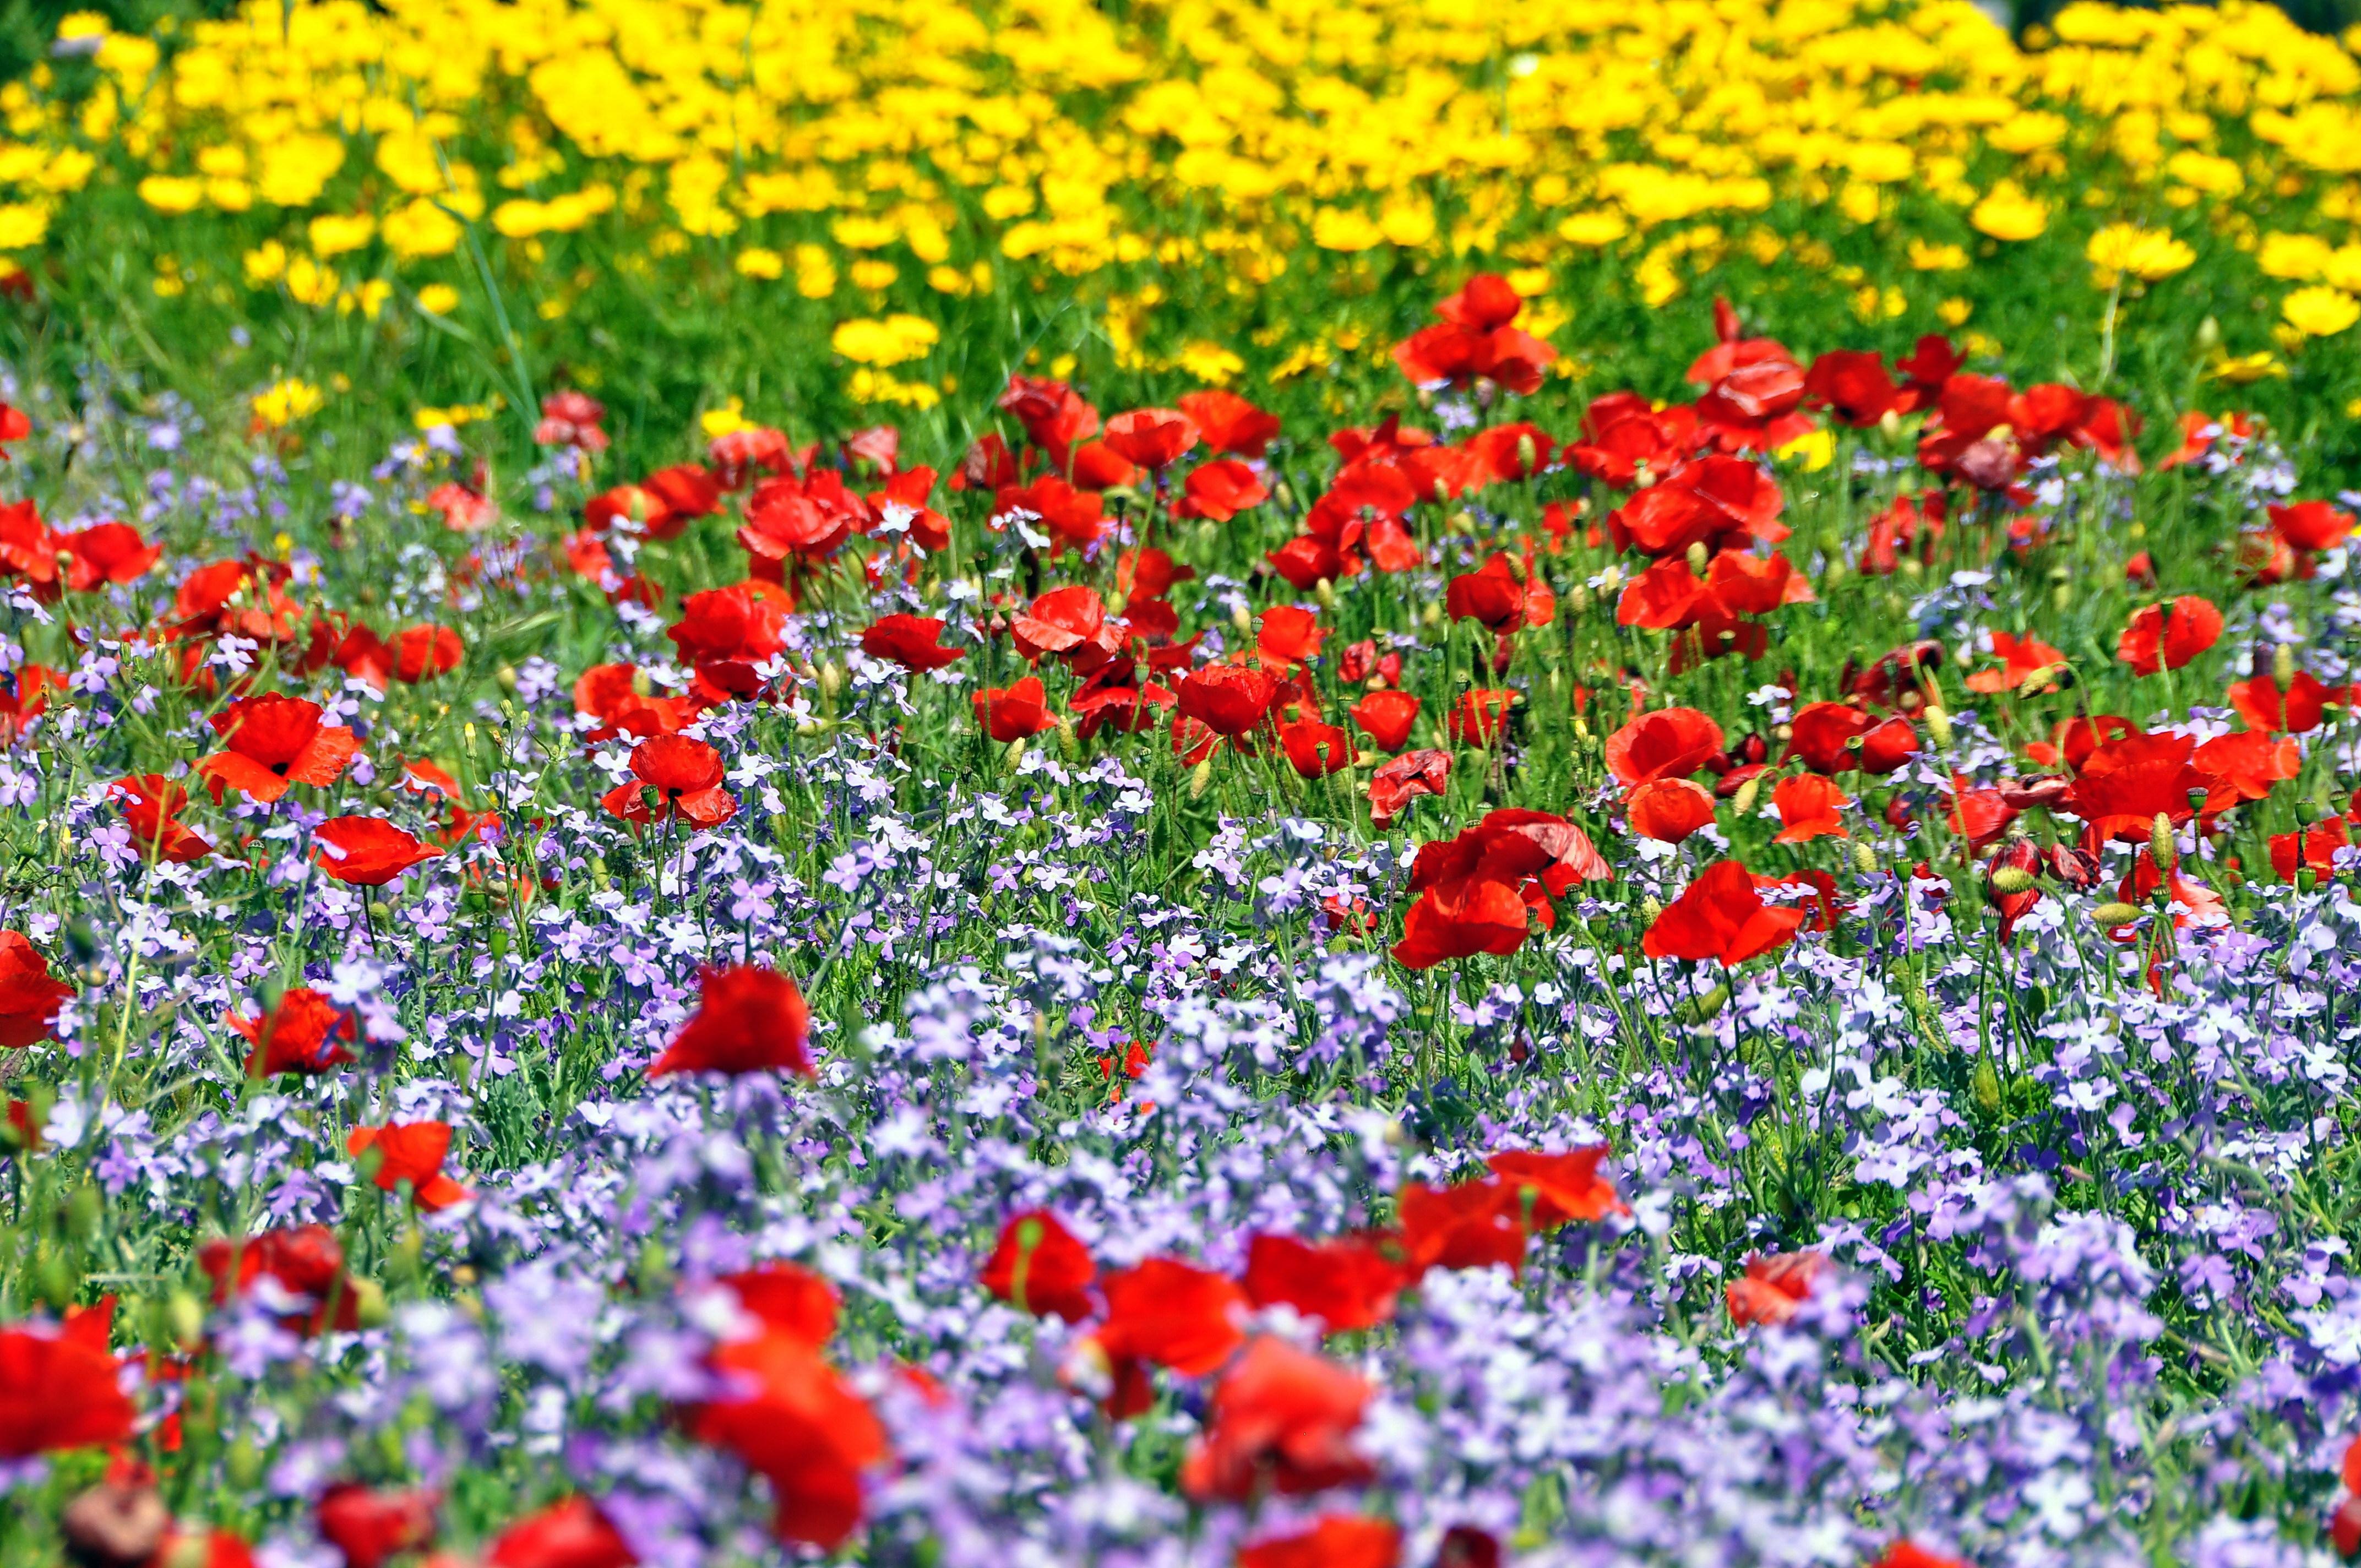 прочитайте фото картинки поляна цветов ней можно ходить